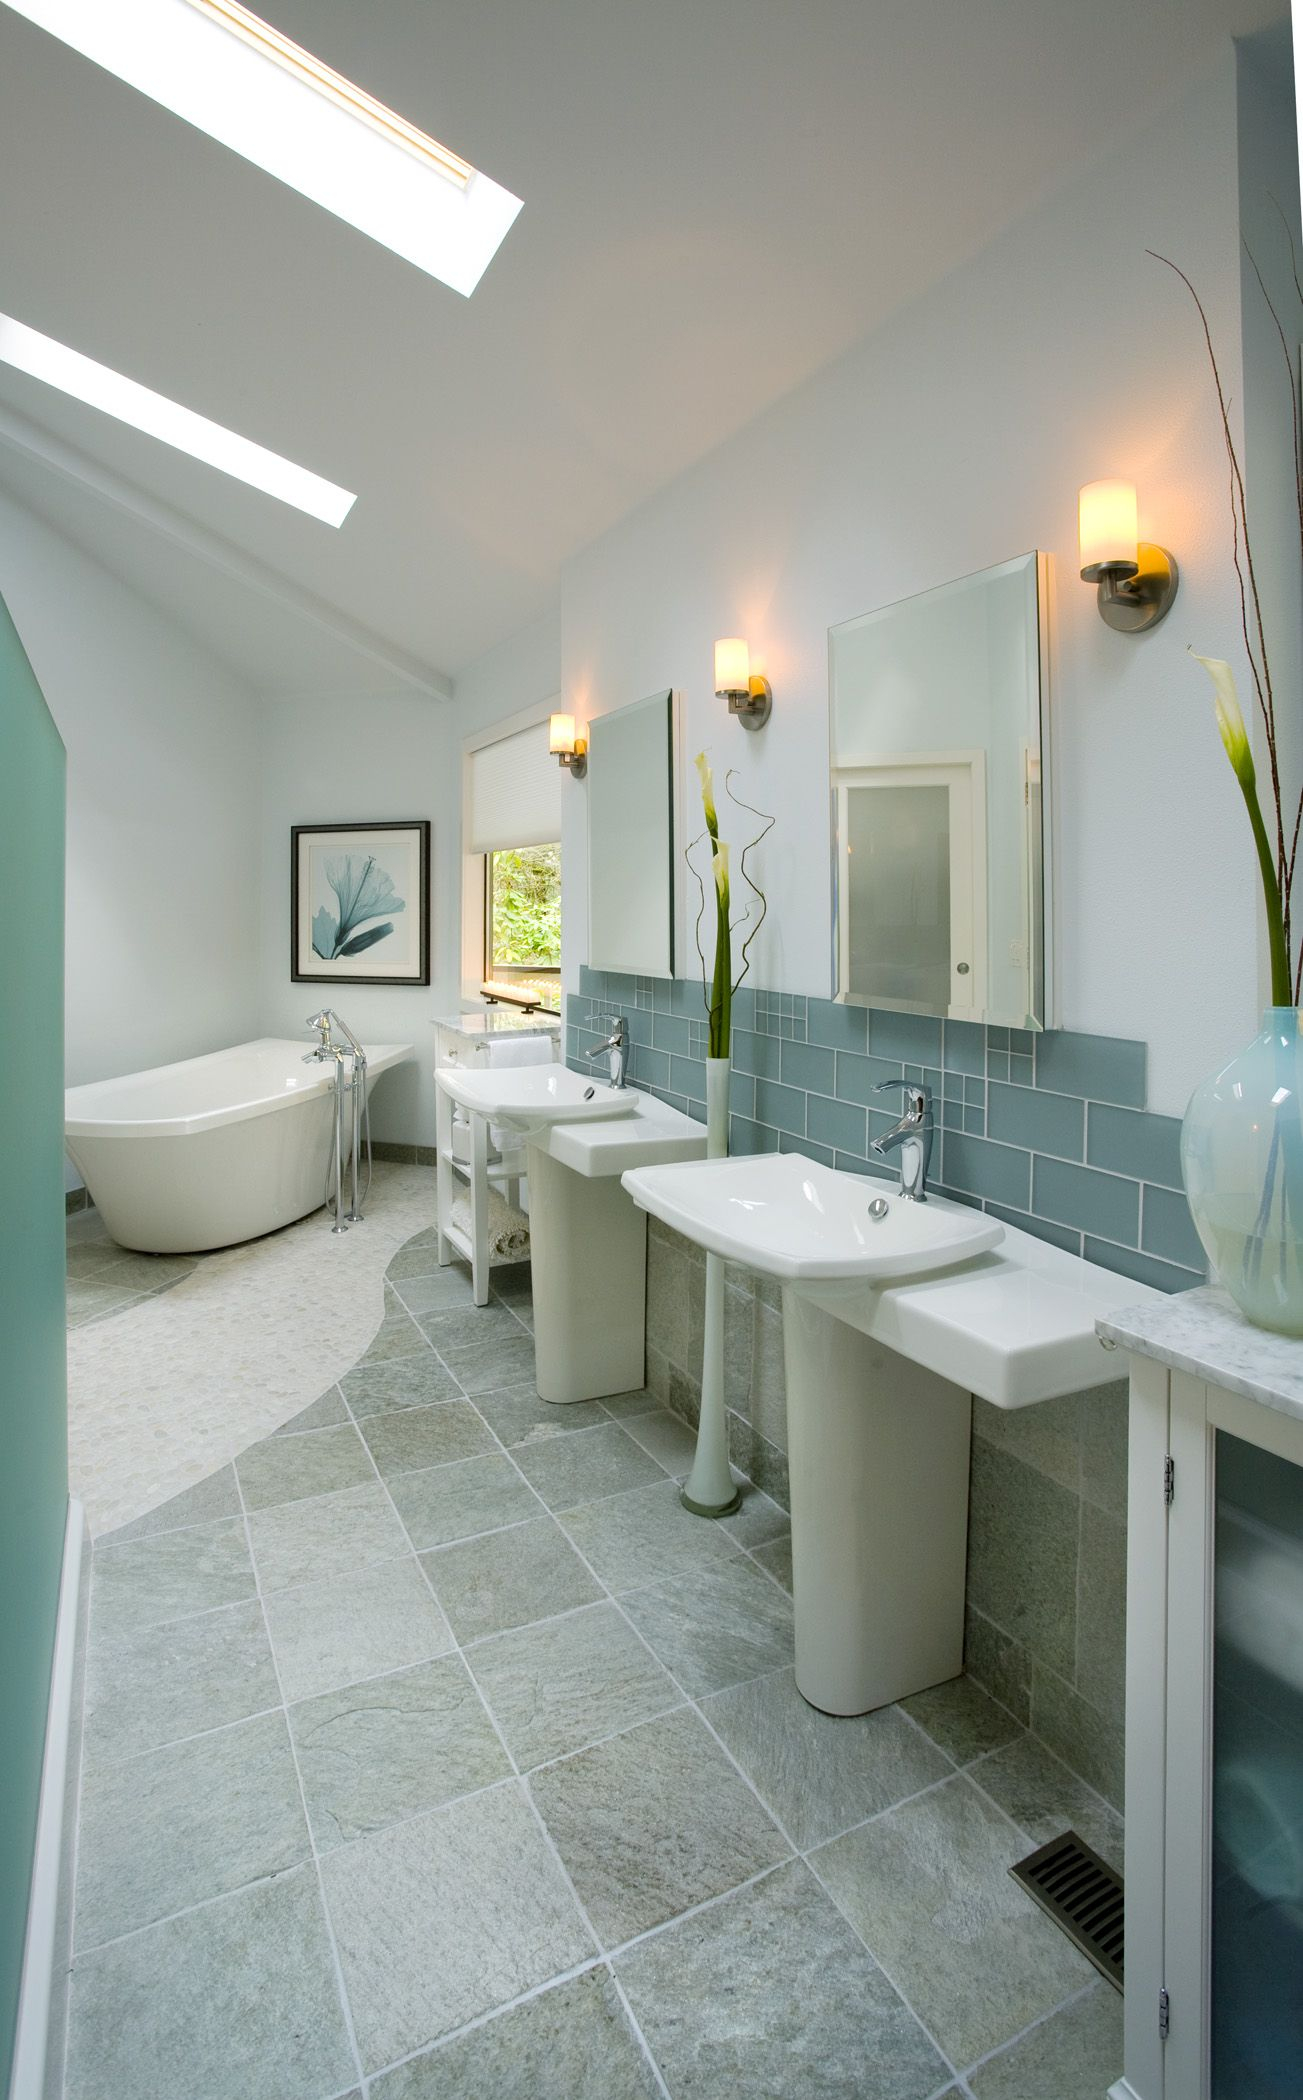 Glass Tile Spa Layout Stone Floor Bathroom Modern Master Bathroom Bathroom Styling